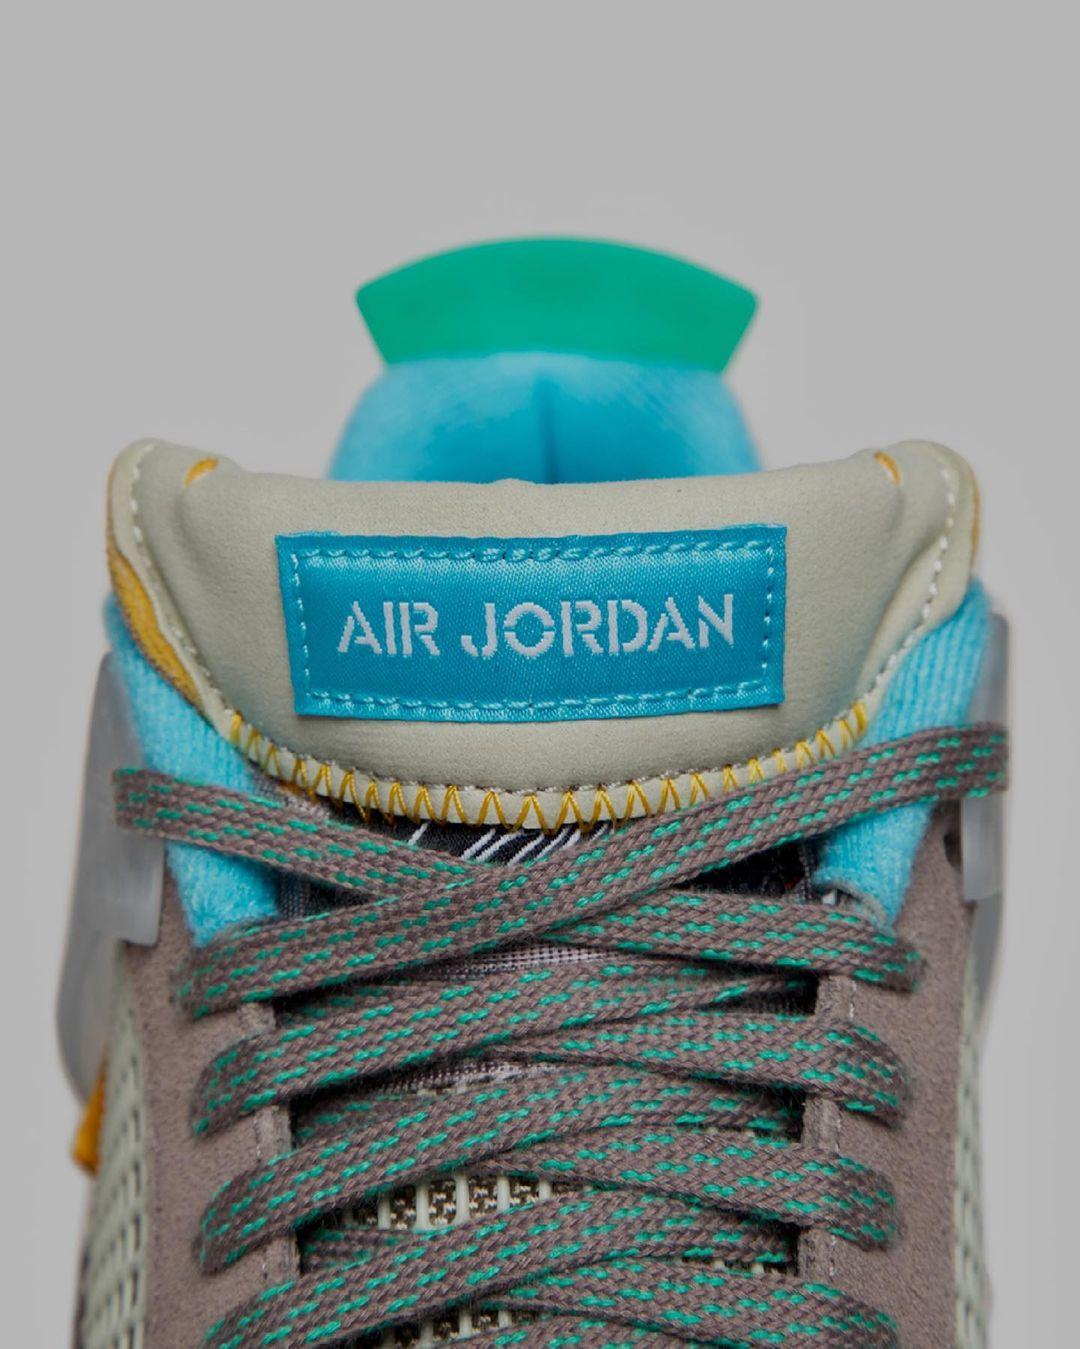 Air Jordan 4,Union,Desert Moss  今早突袭!Union x AJ4 市价小 3000!你抢到了吗?